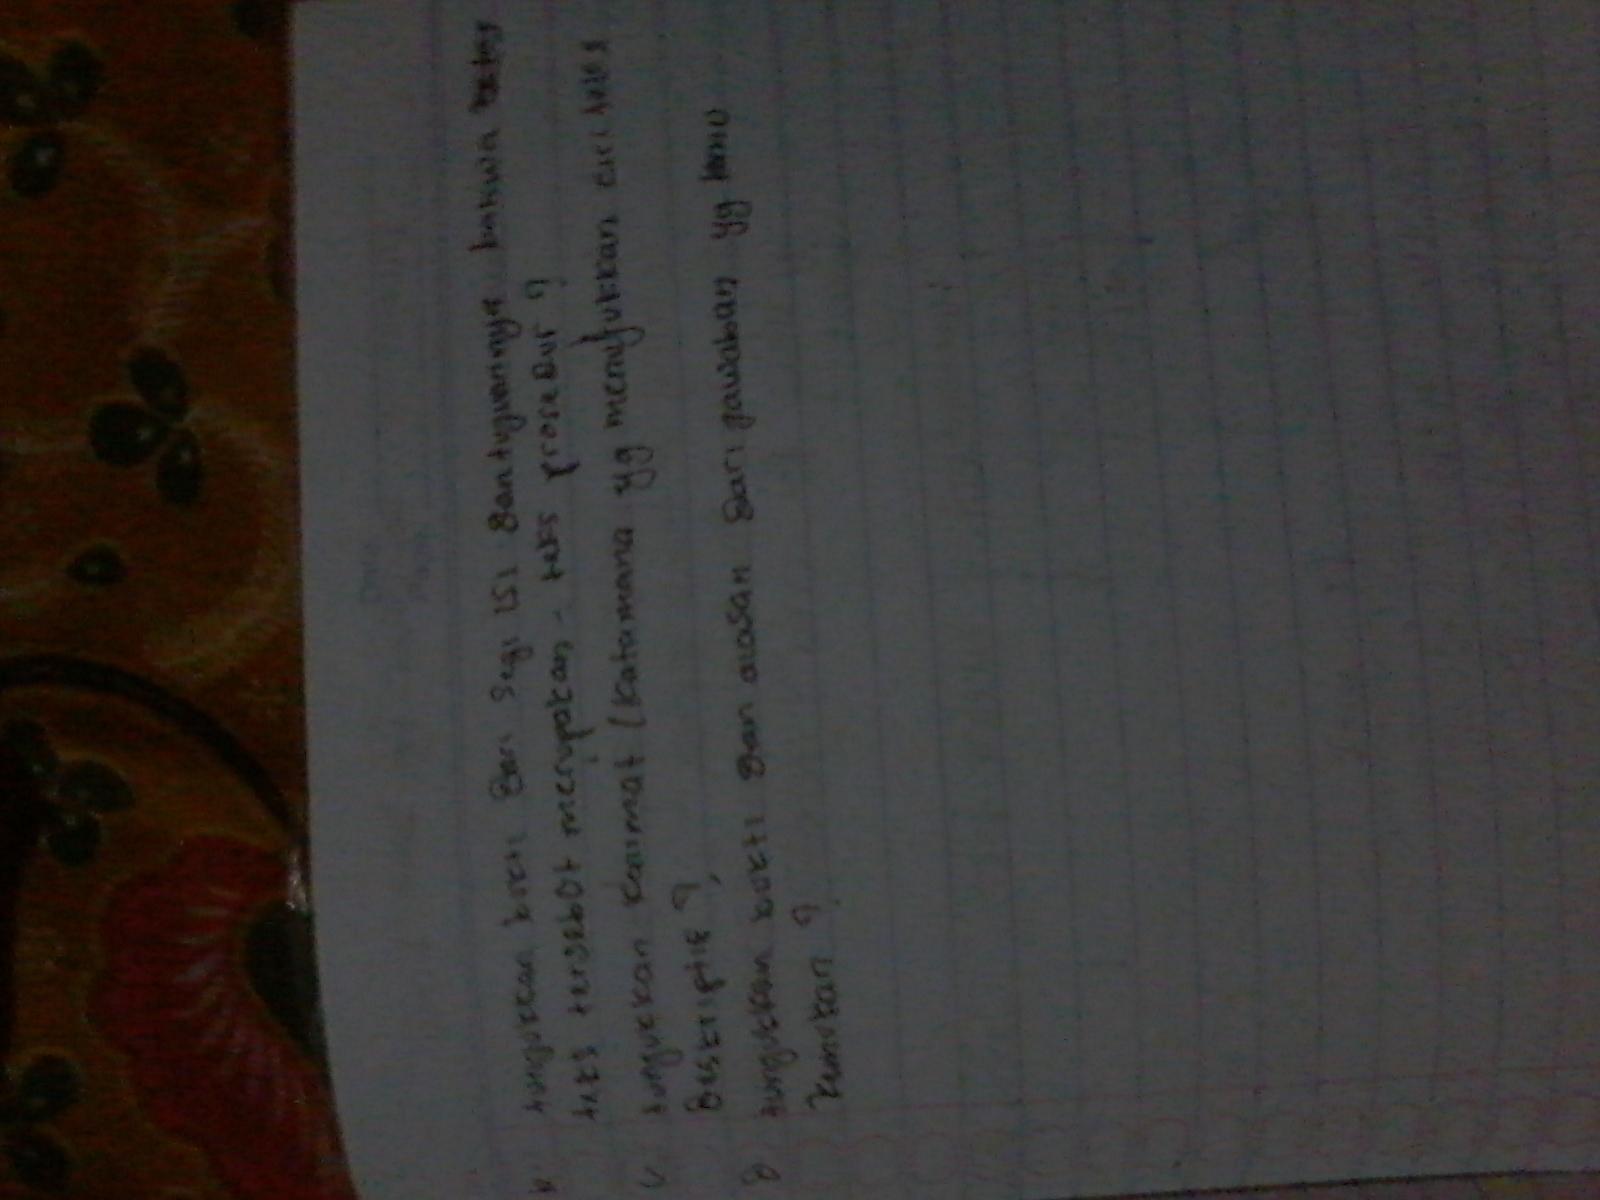 Stree purush samanta essay in marathi